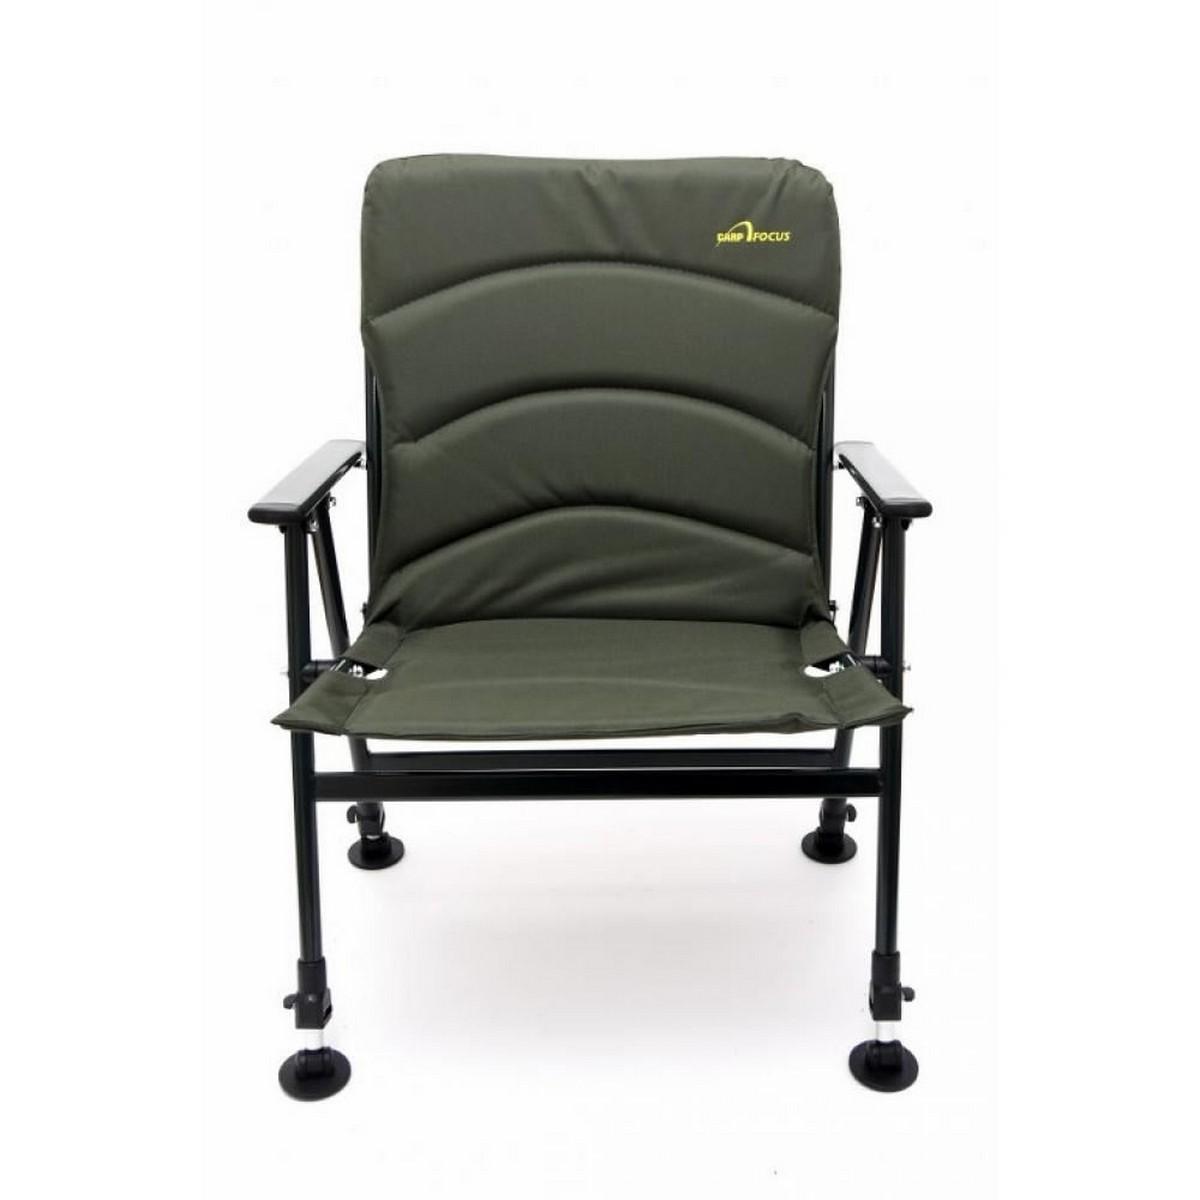 Шаранджийски стол Carp Focus Armour Chair 047